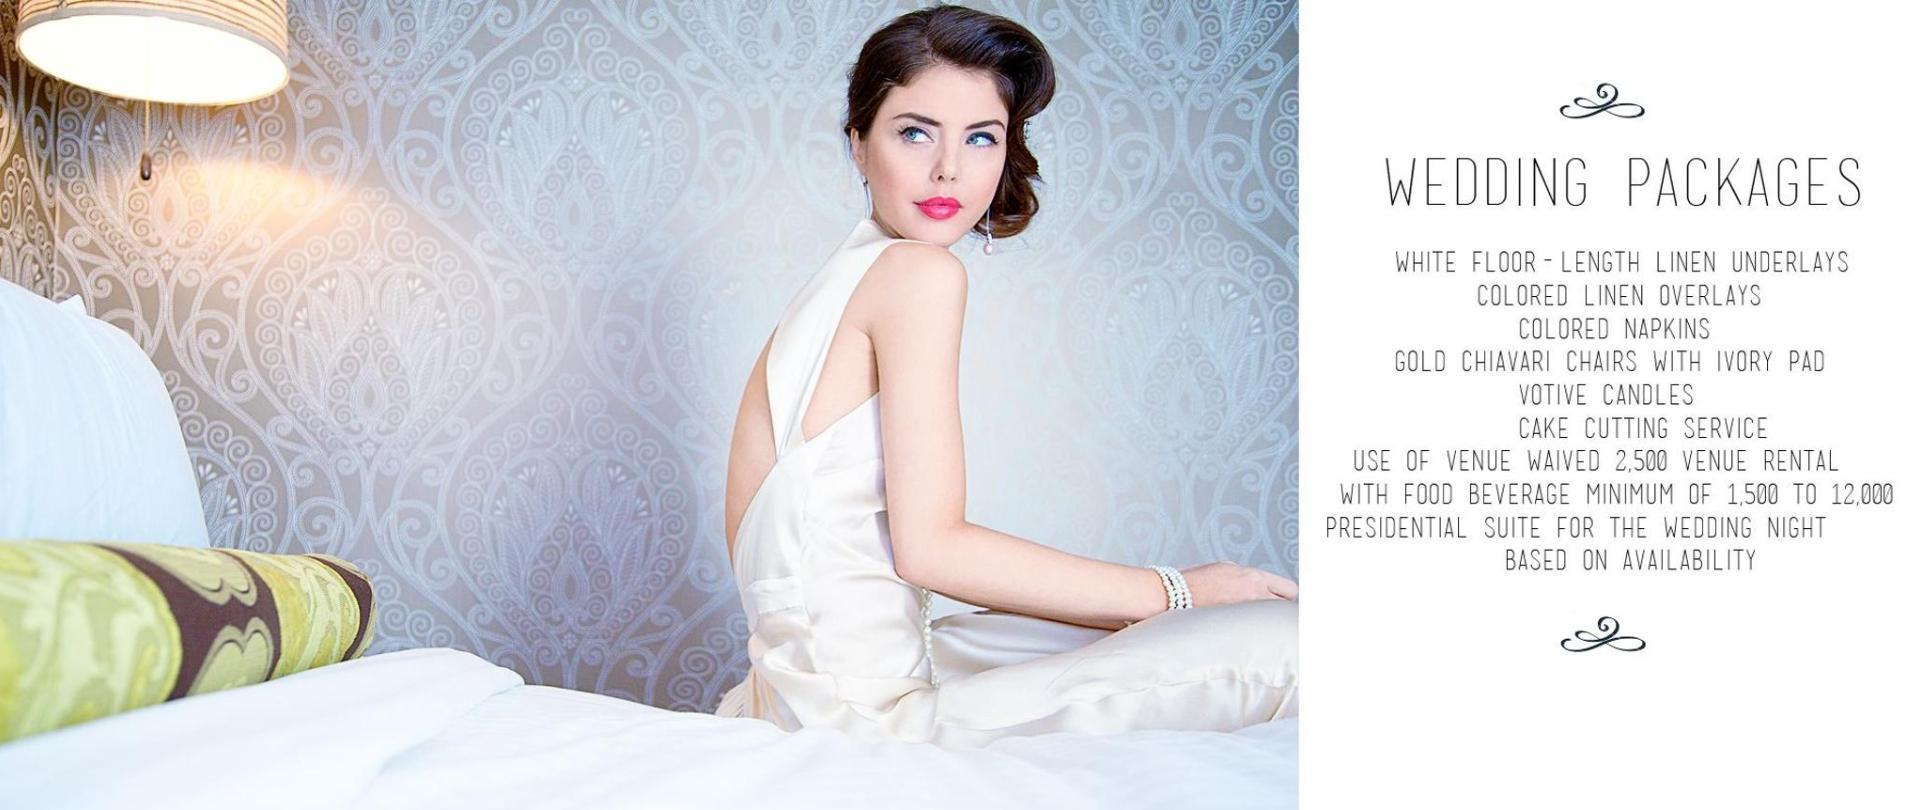 lafayette-web-banner-wedding-mse-2014-flat-copy.jpg